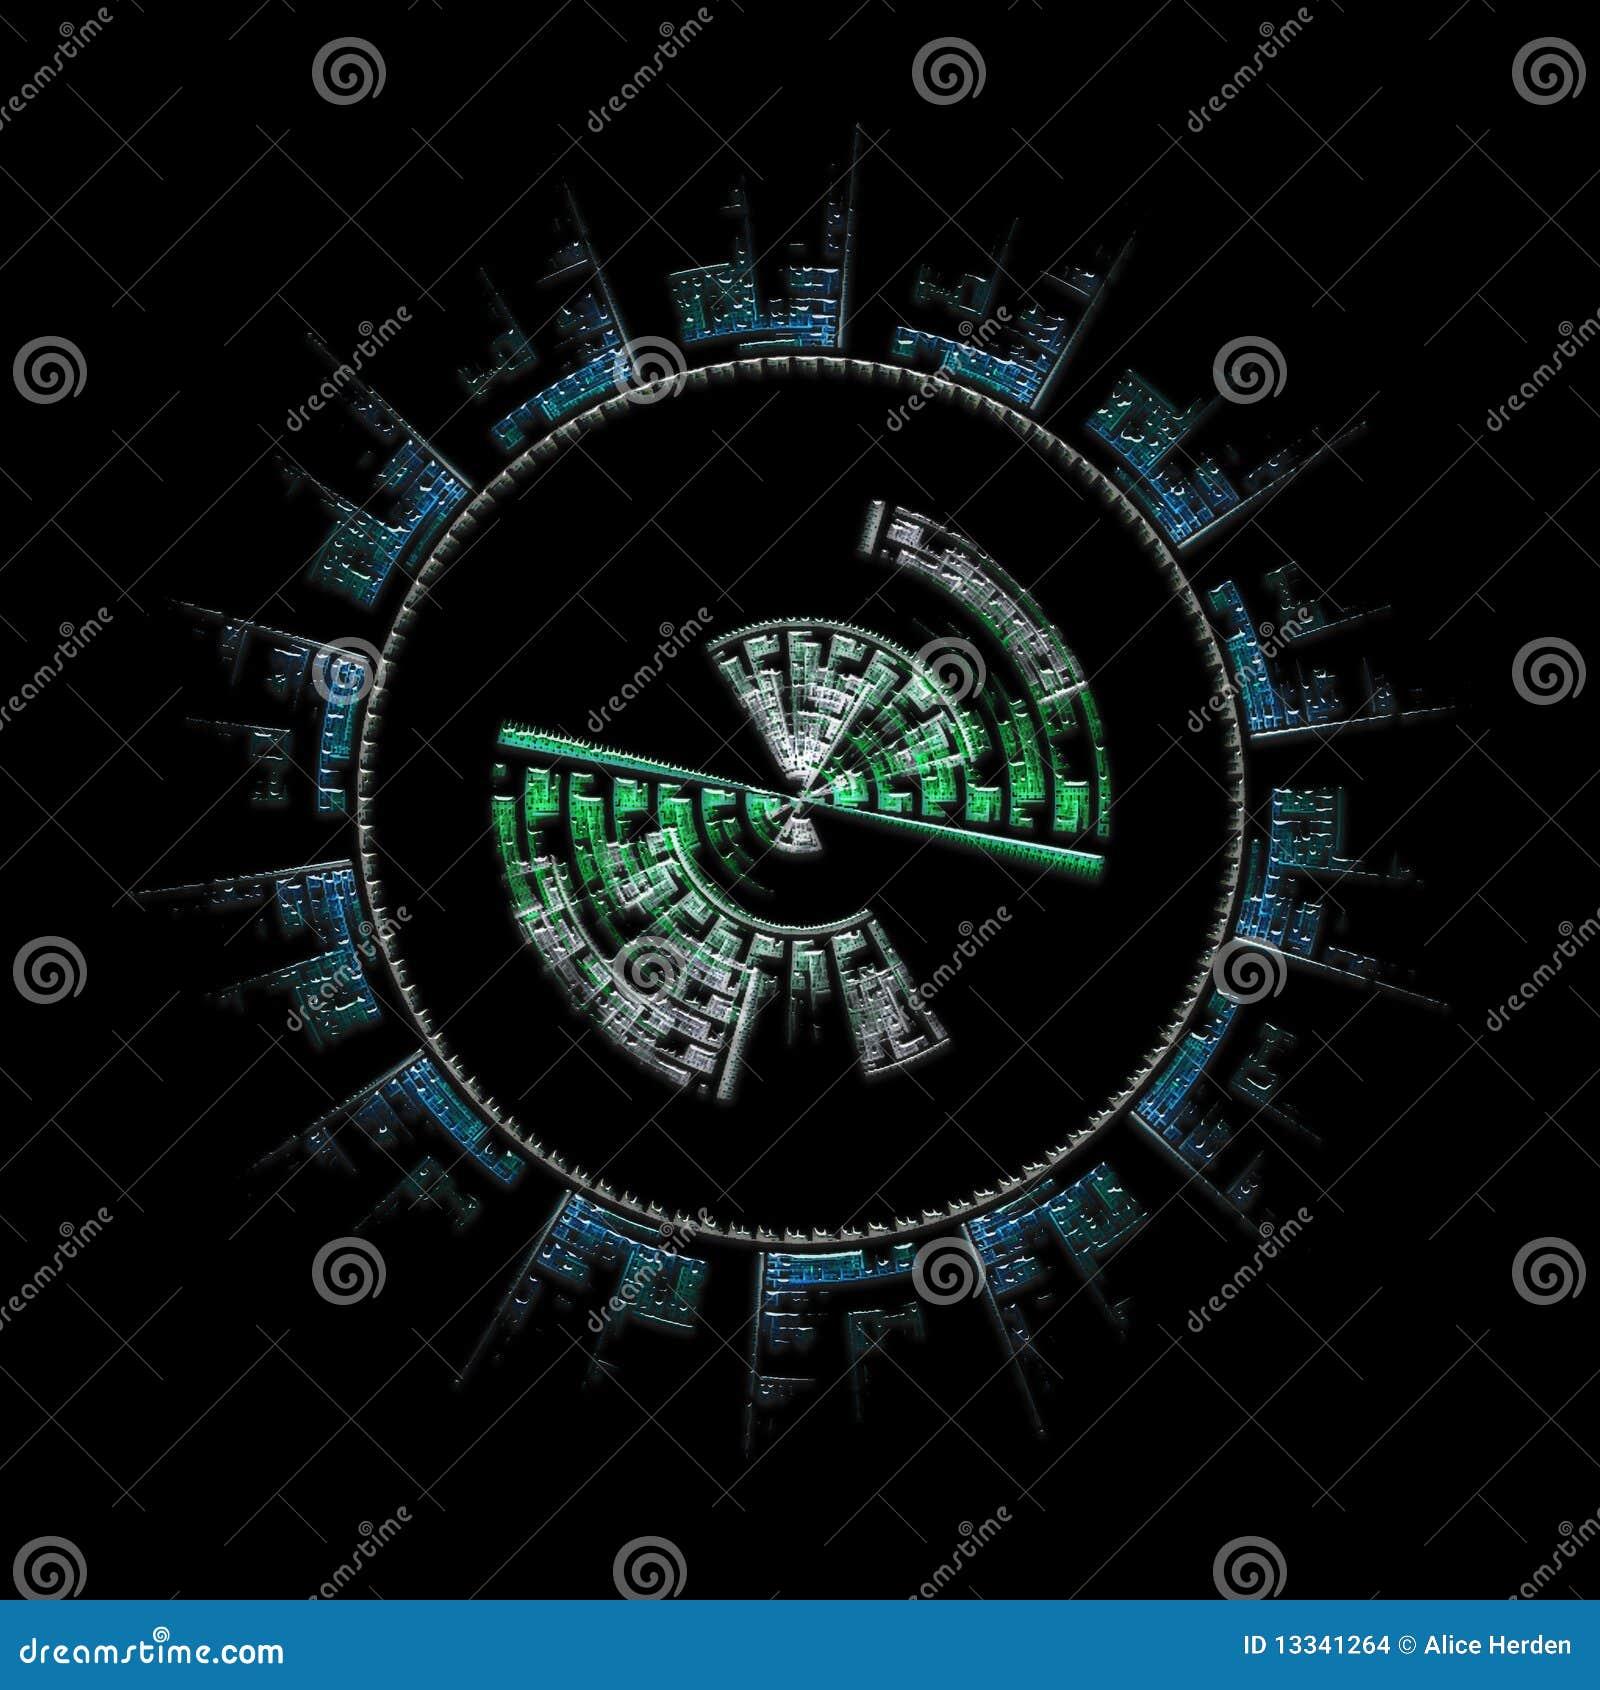 Fi sci symbol